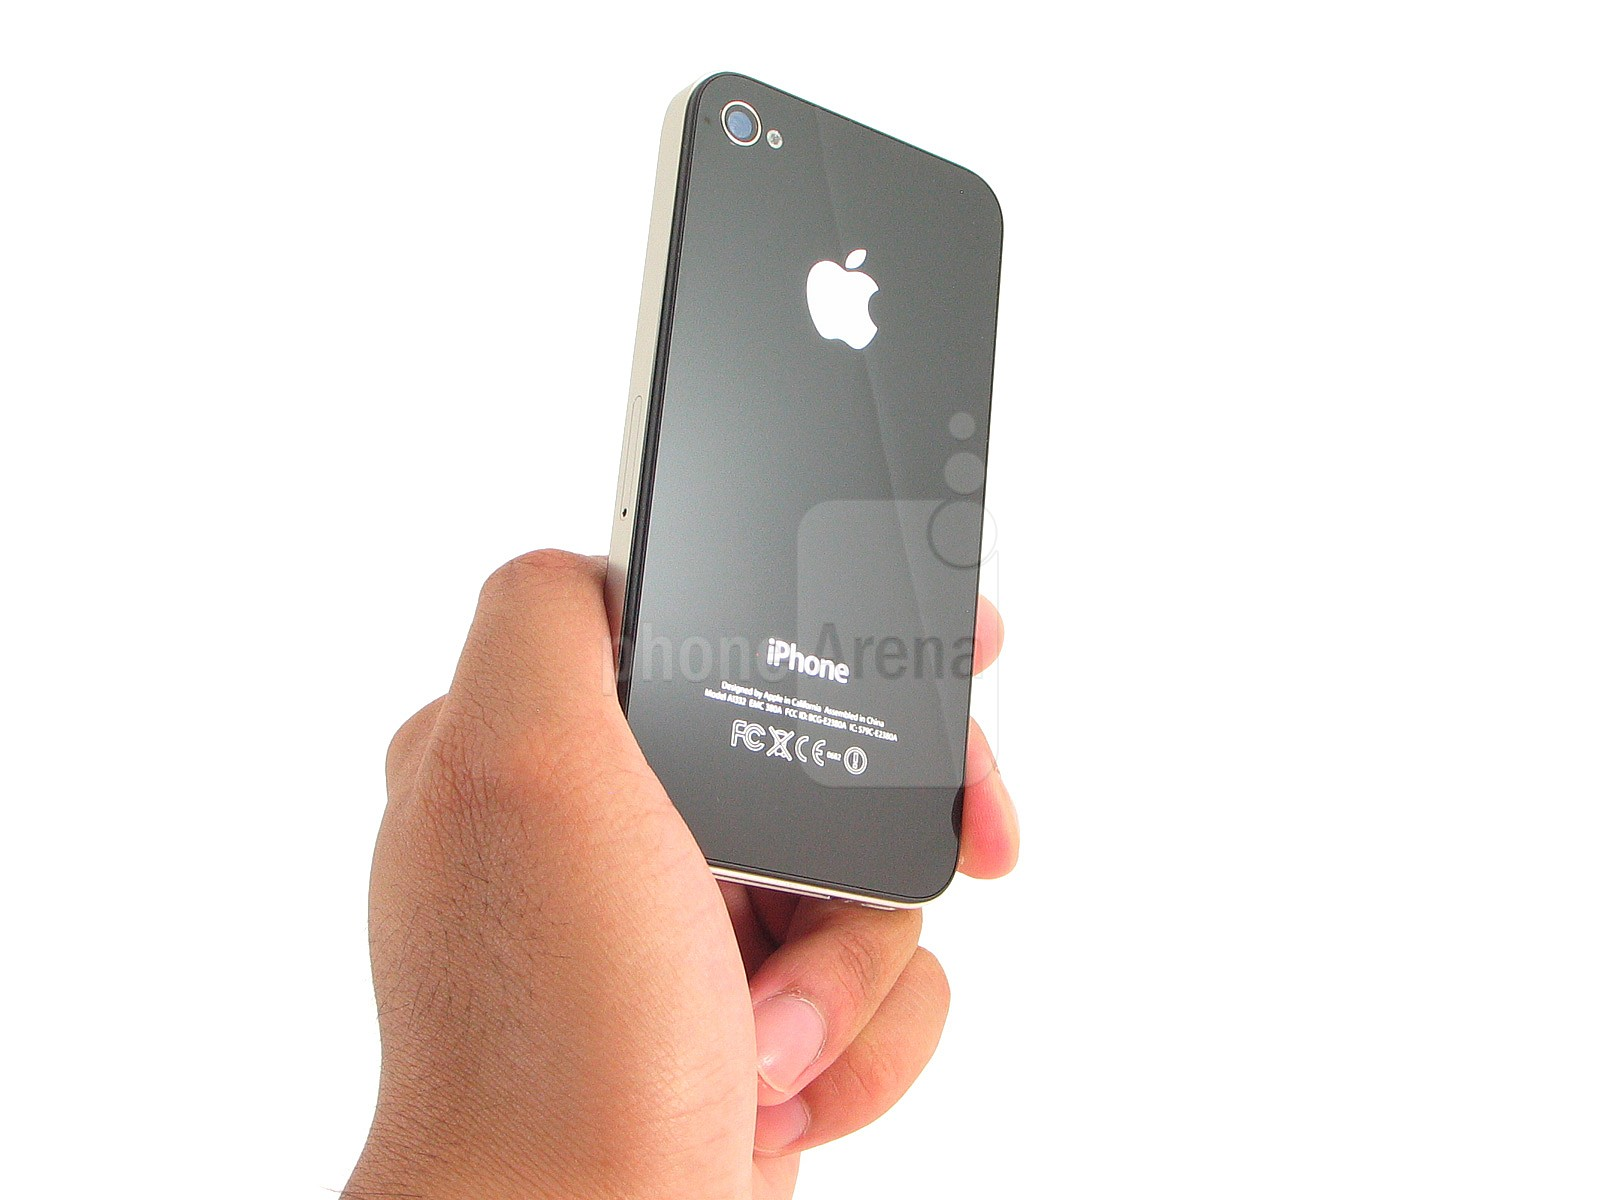 Apple iPhone 4 6